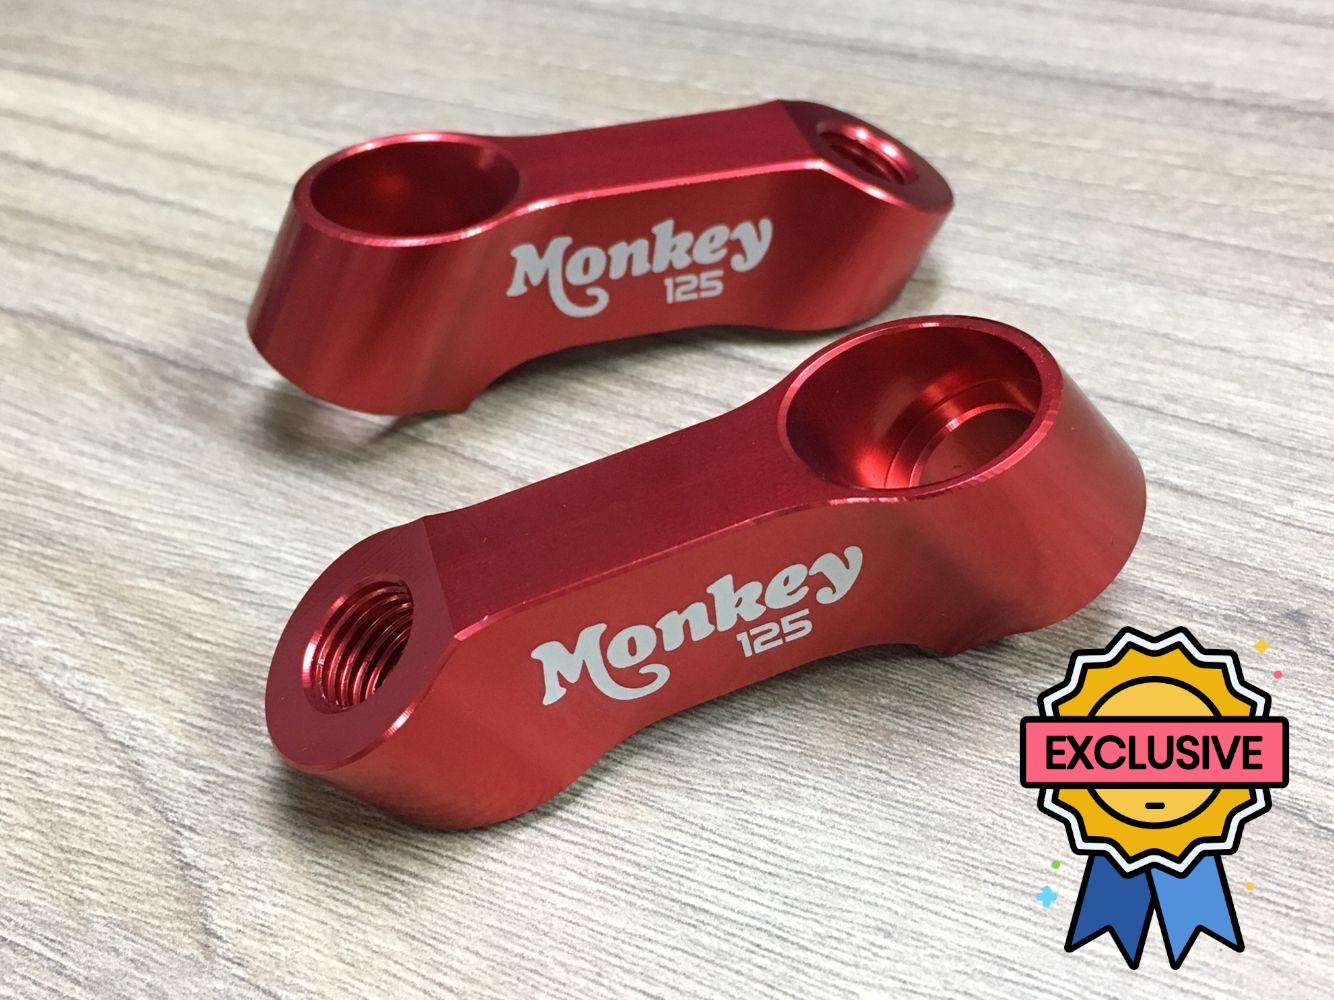 Honda Monkey 125 Z125M Red Mirror Extenders